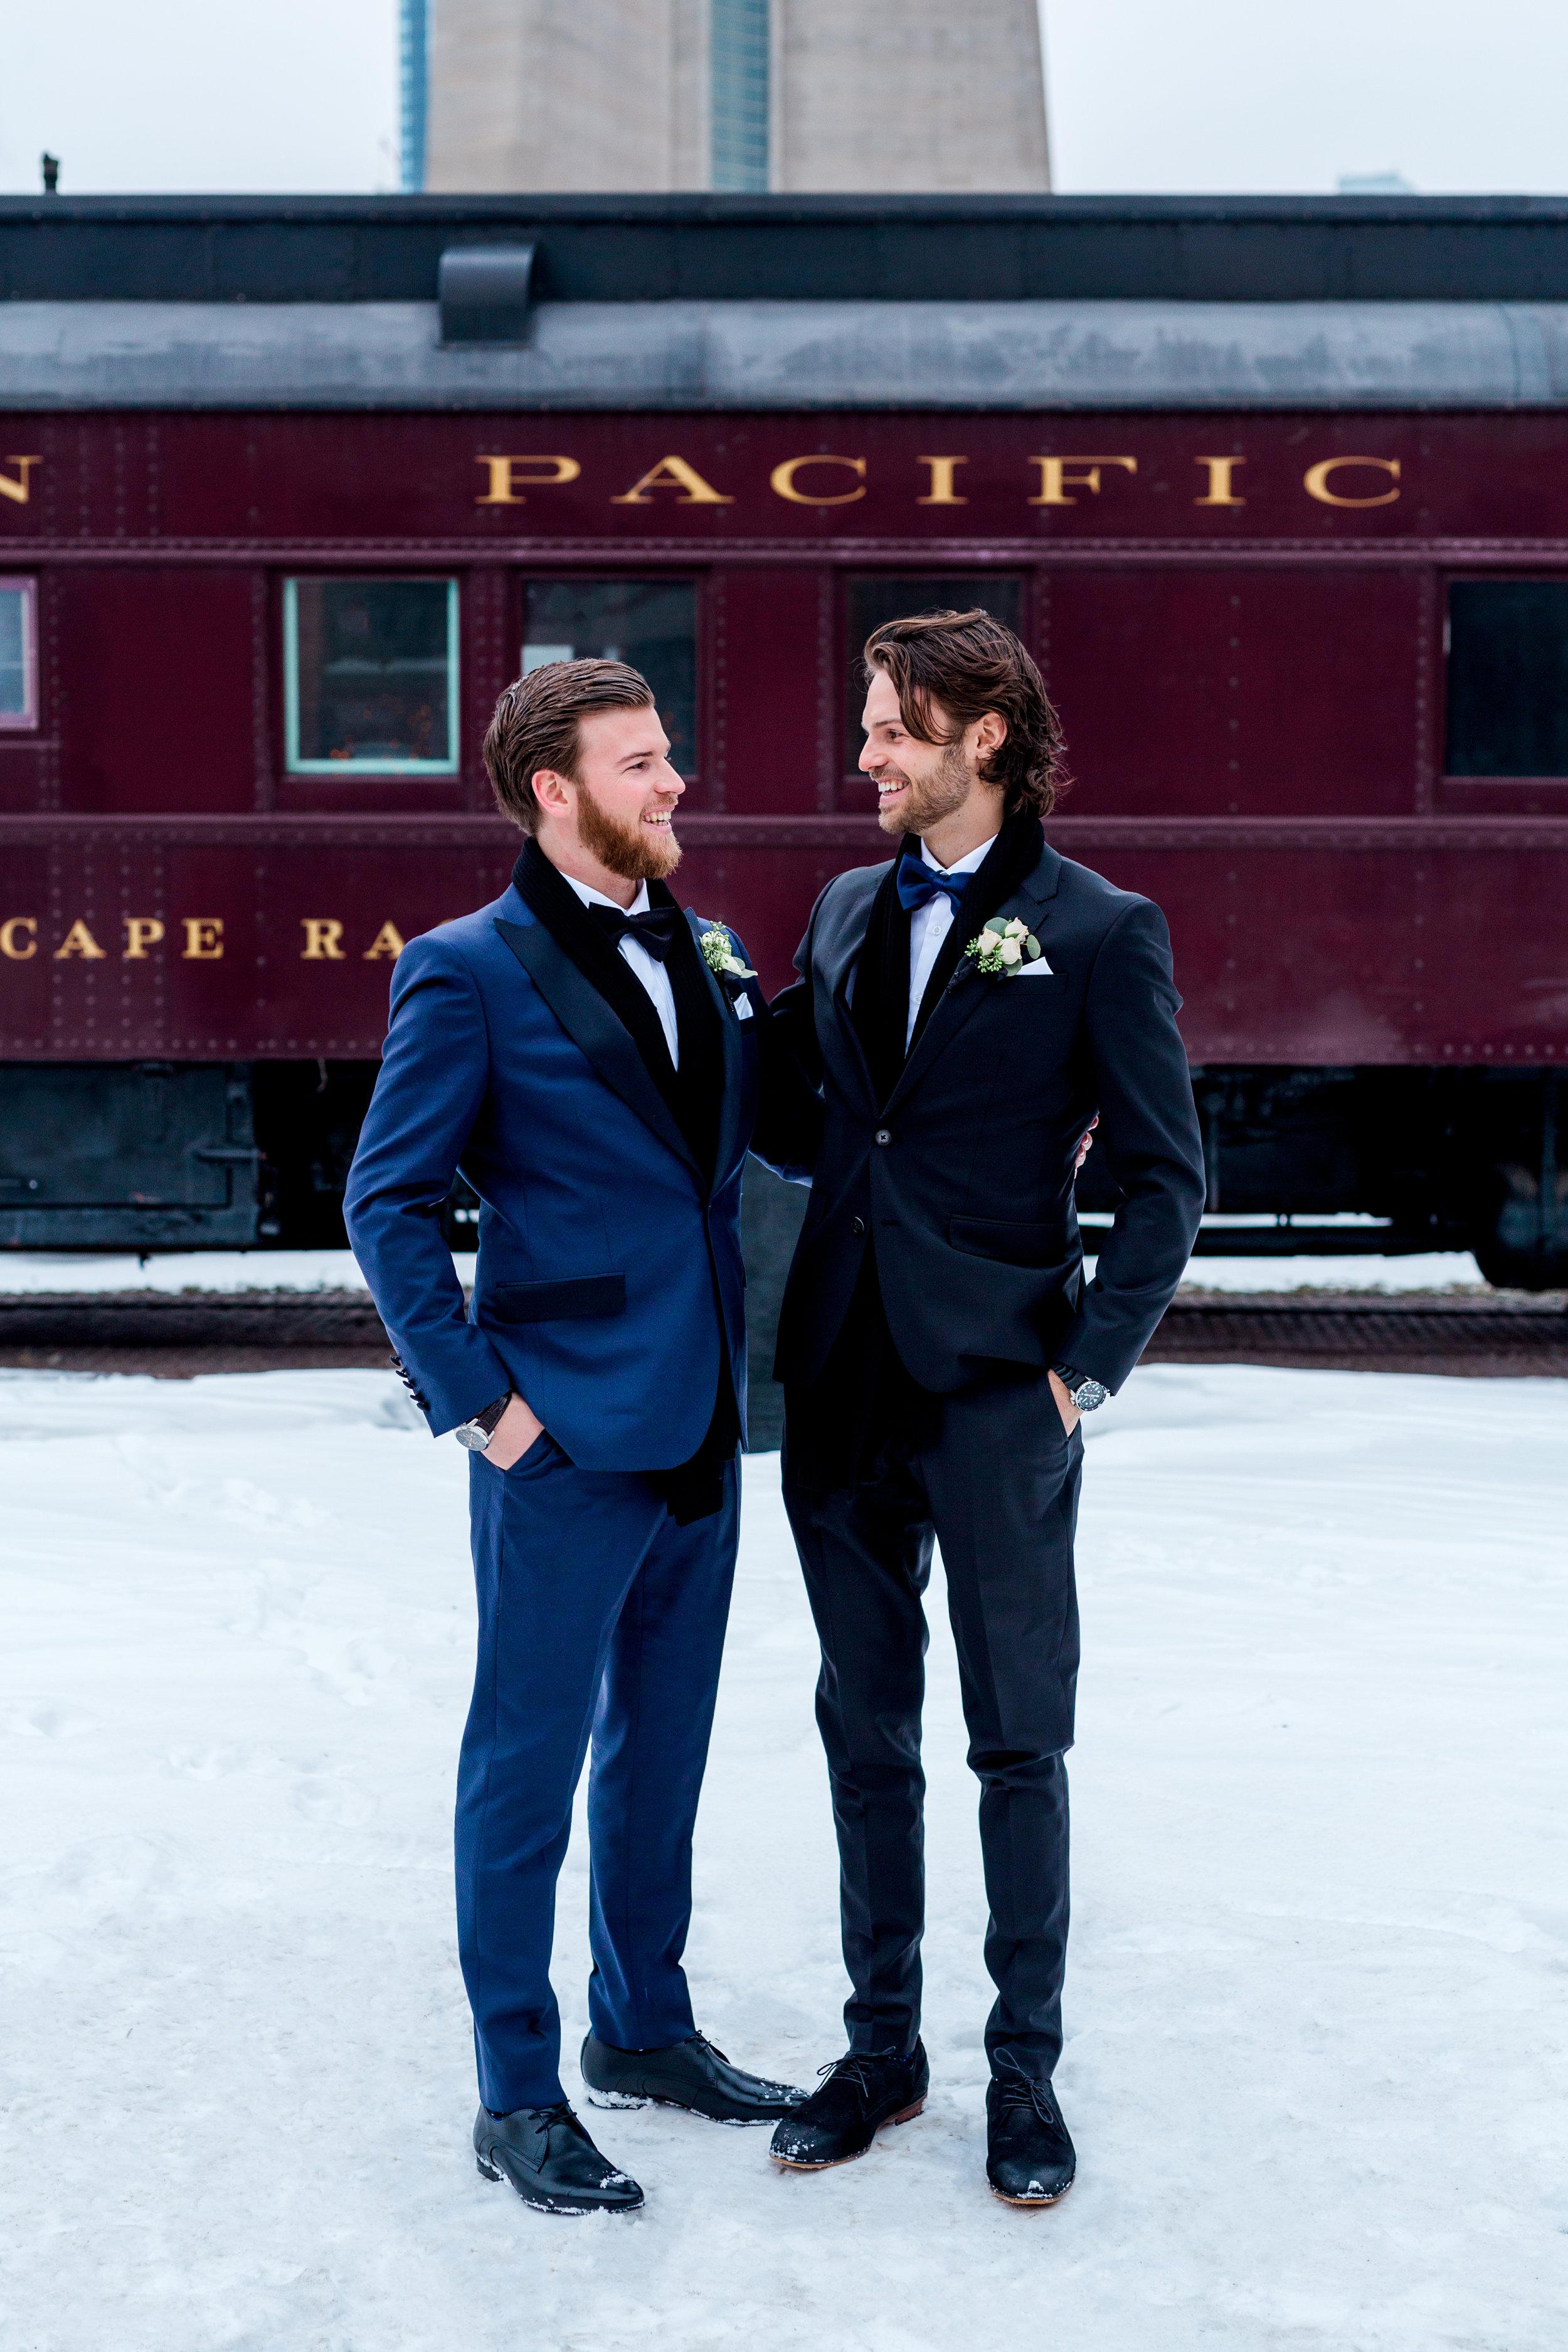 Amir_Danielle_Whitfield_Wedding_Steam_Whistle_Toronto_392.jpg